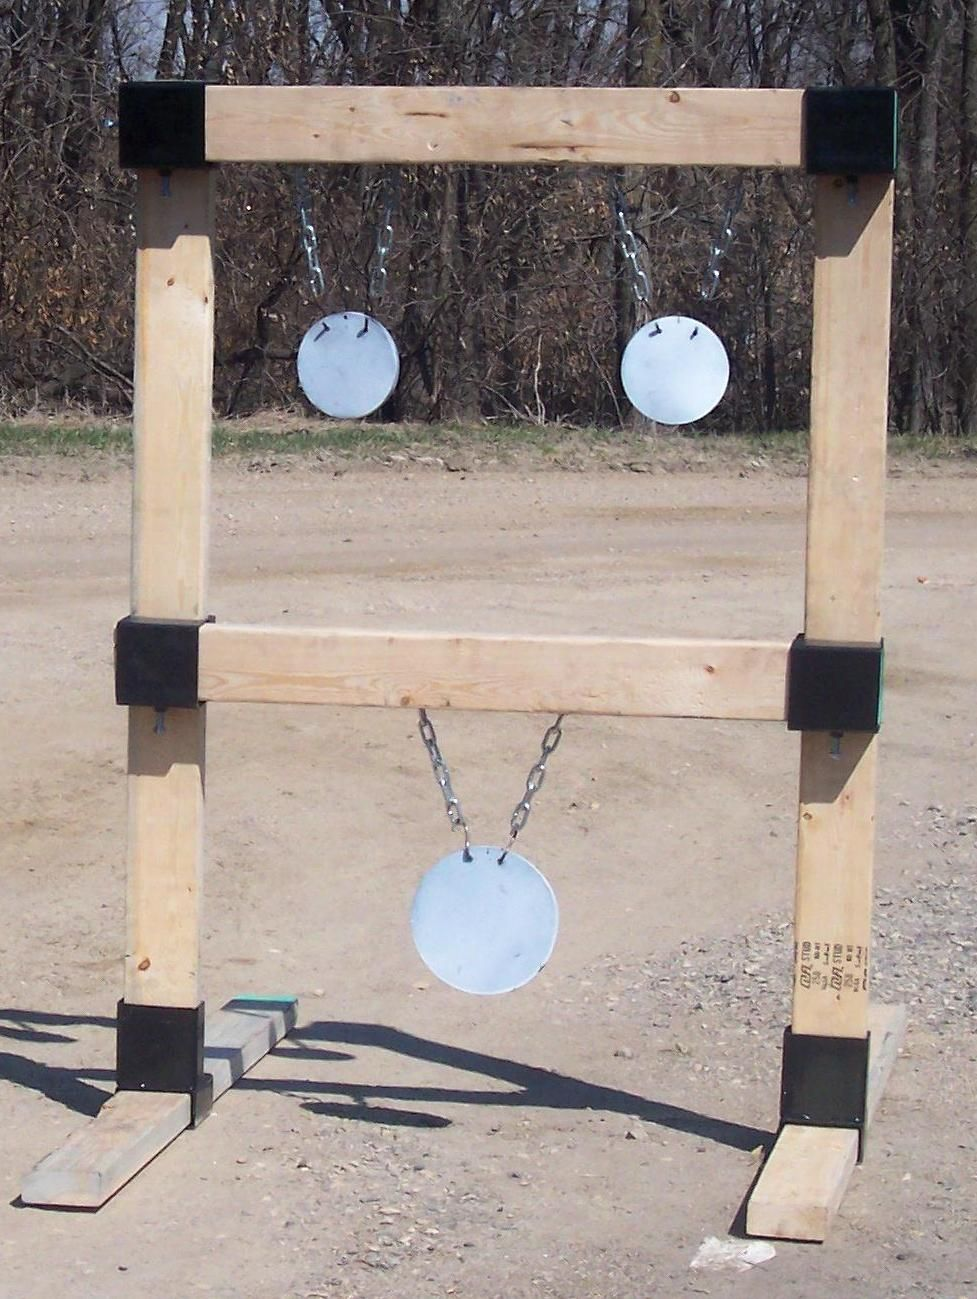 2x4 Hanging Target Stand Custom Steel Targets Jocuri